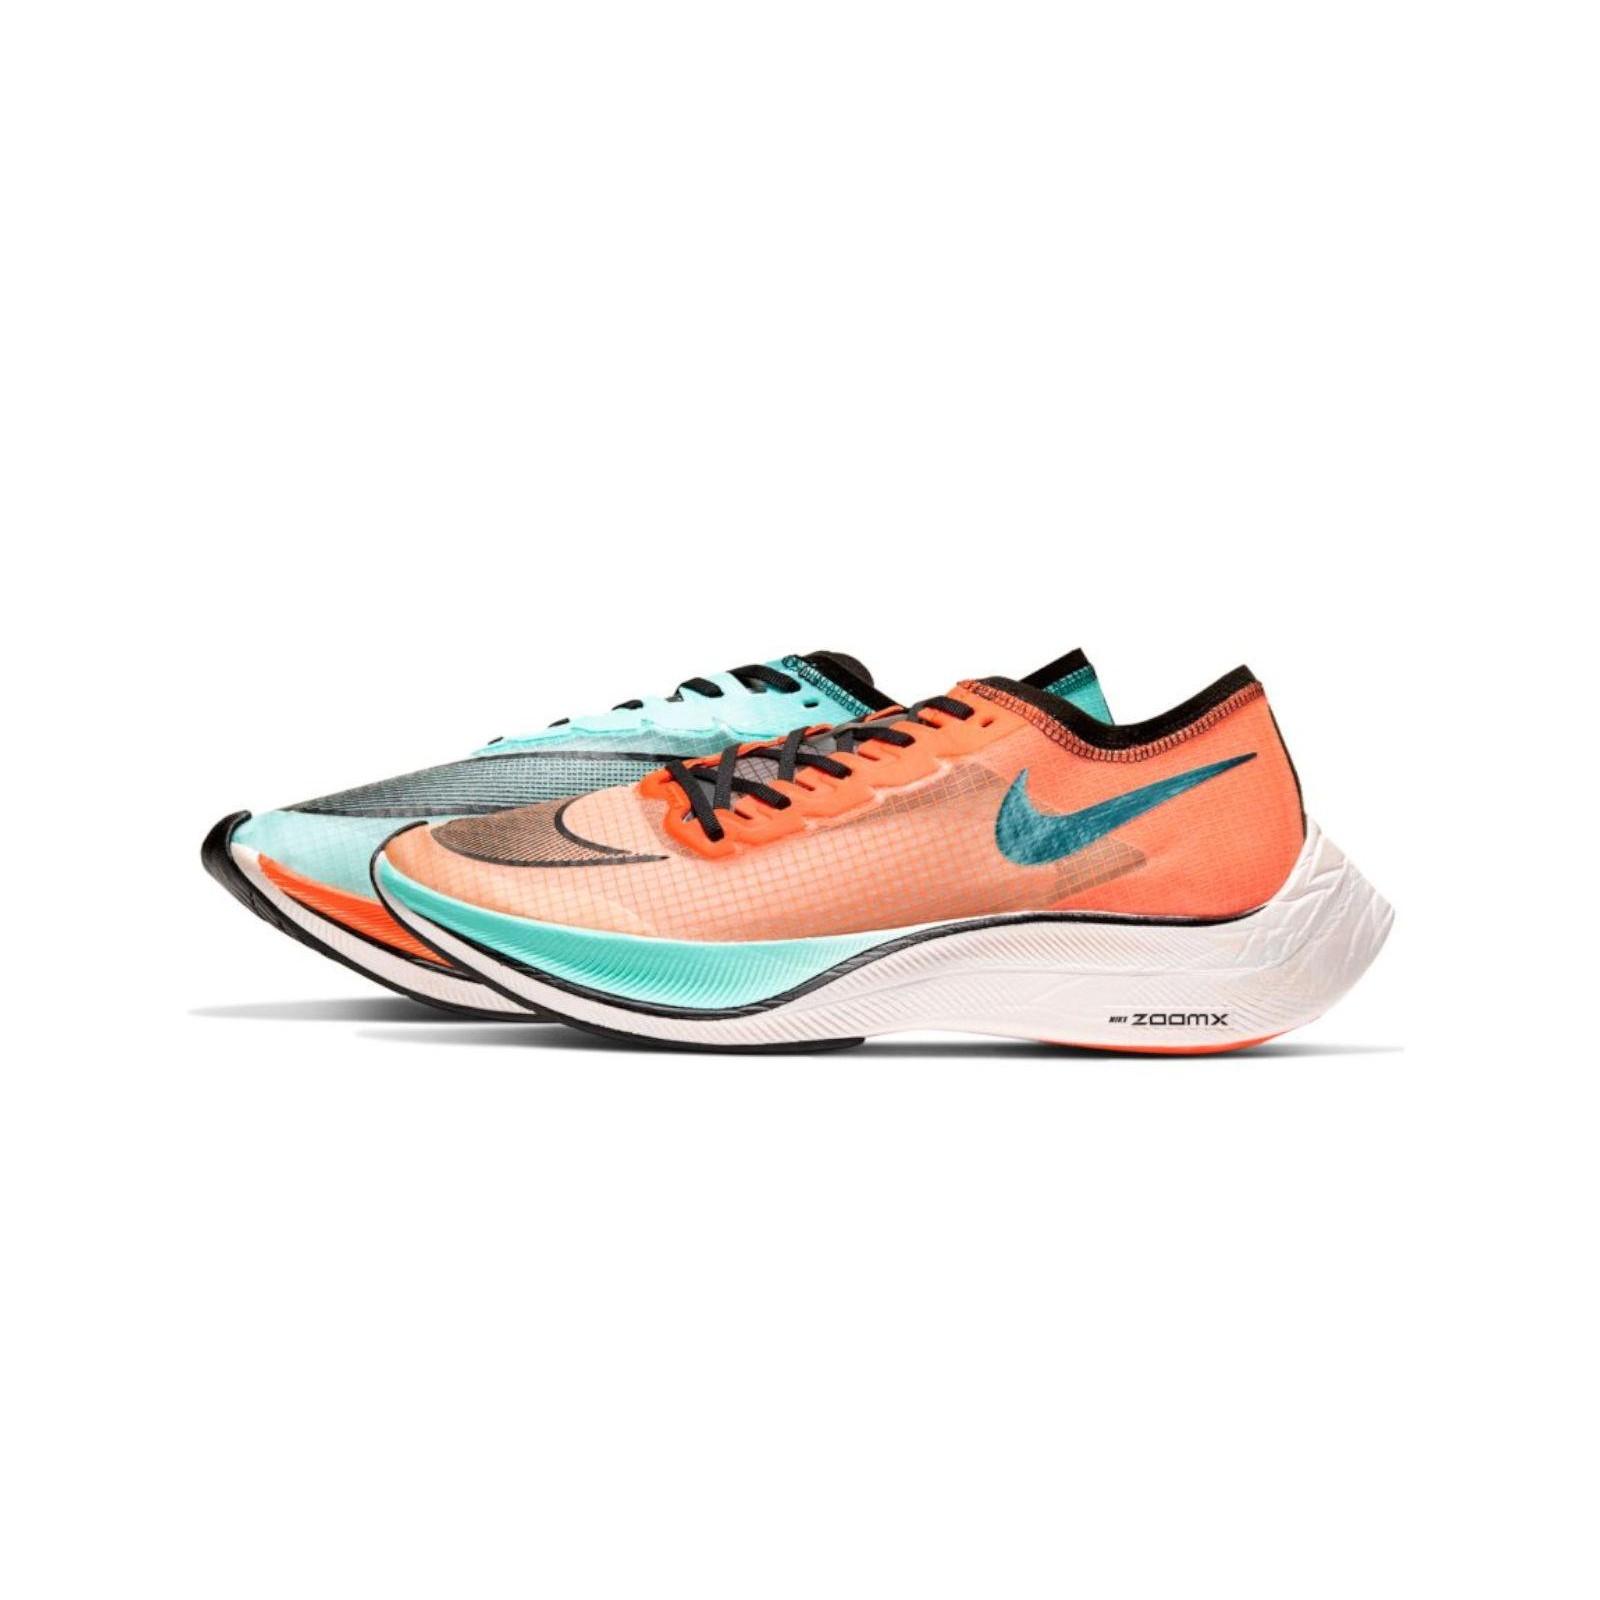 Nike VAPORFLY NEXT% HAKONE NIKCD4553300